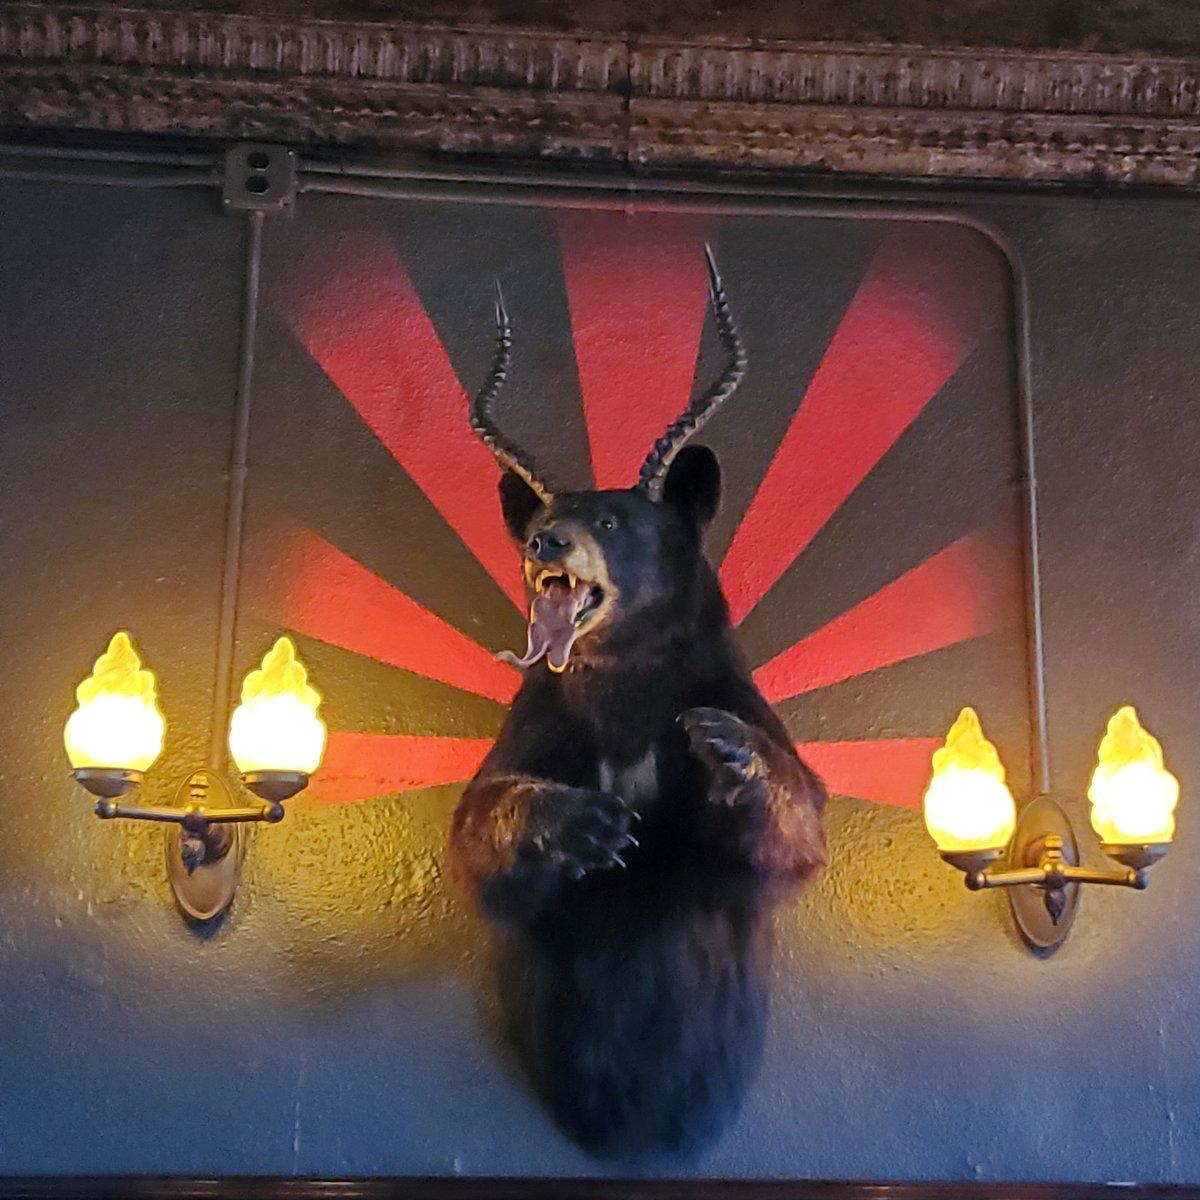 Bear Diablo exists. #losthighwaybar #weekendmood pic.twitter.com/WOYspQE5ET